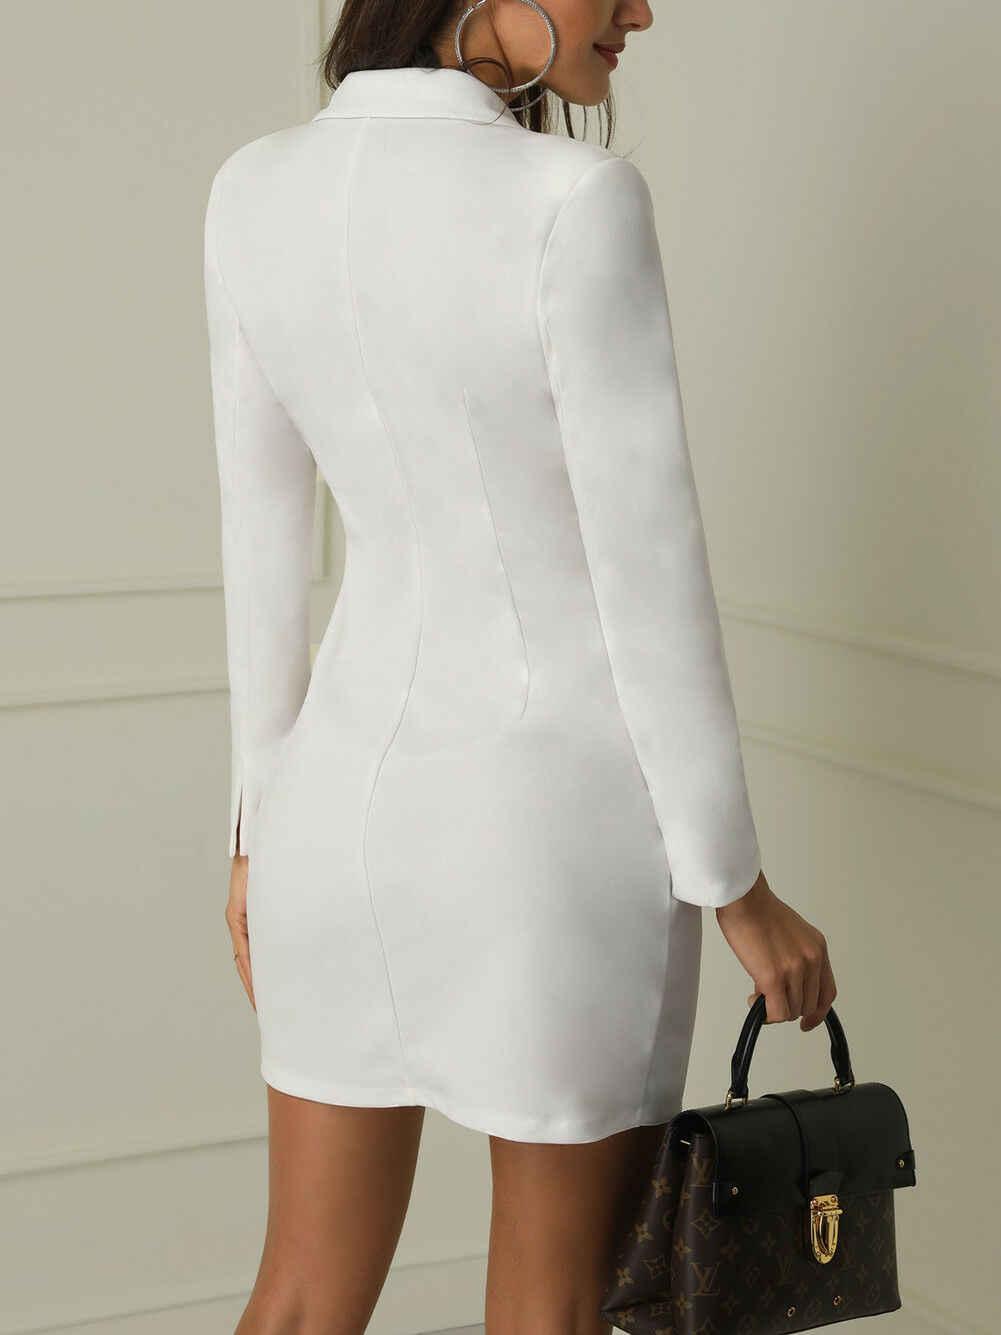 Elegante plissado dupla breasted mulheres vestido 2019 Outono inverno Escritório vestido casual branco blazer terno slim senhoras vestidos